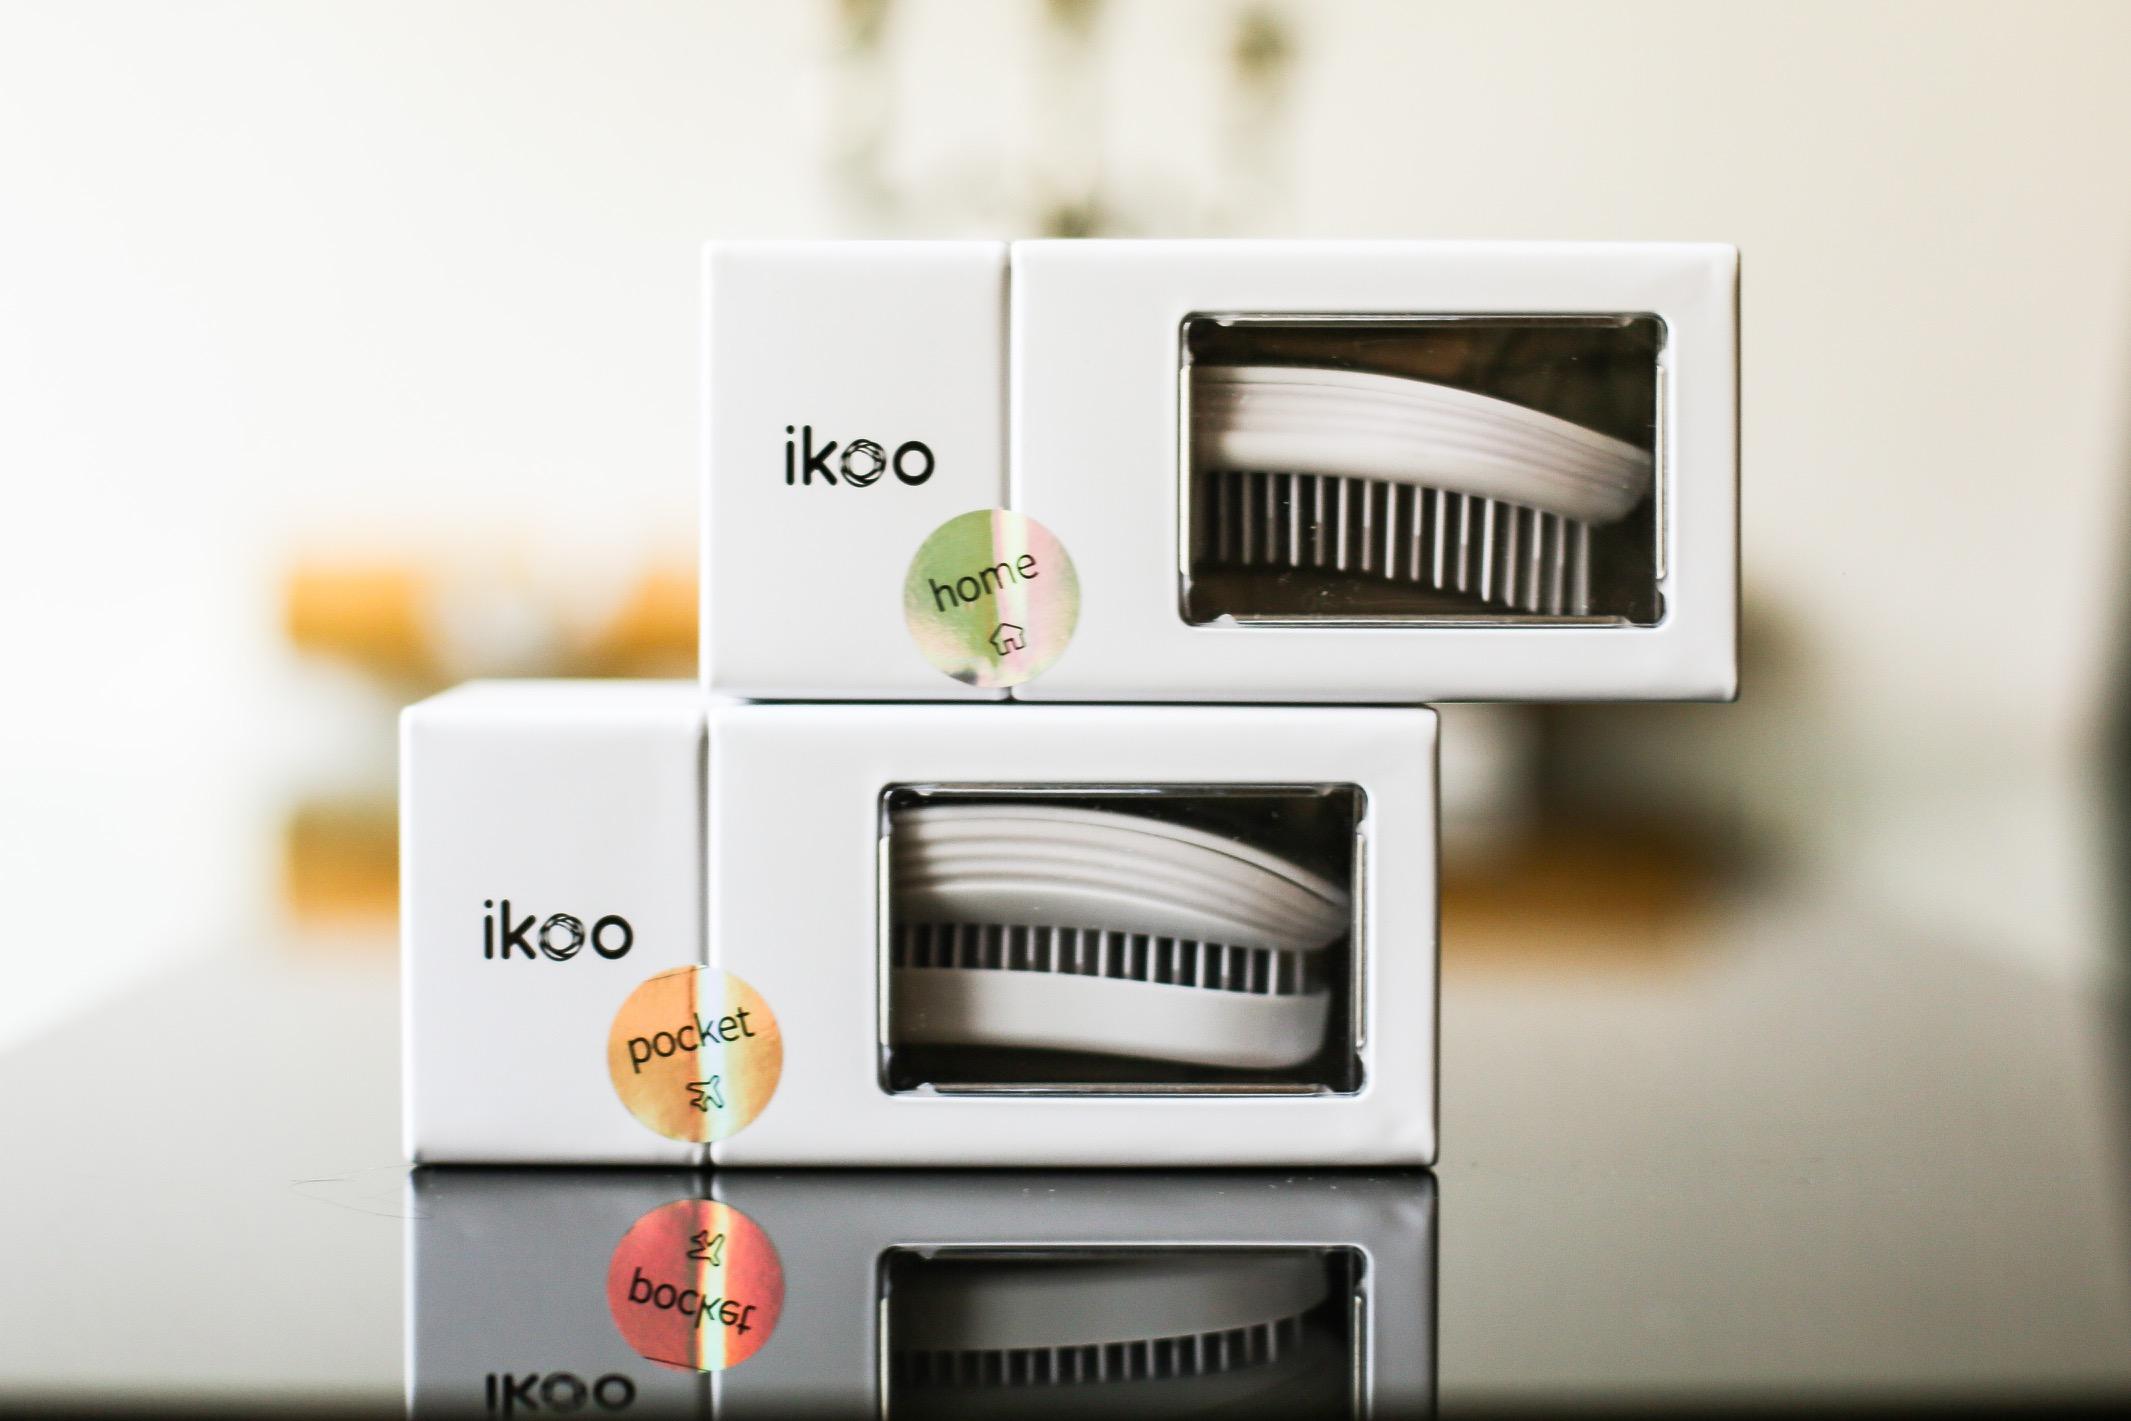 ikoo home + pocket